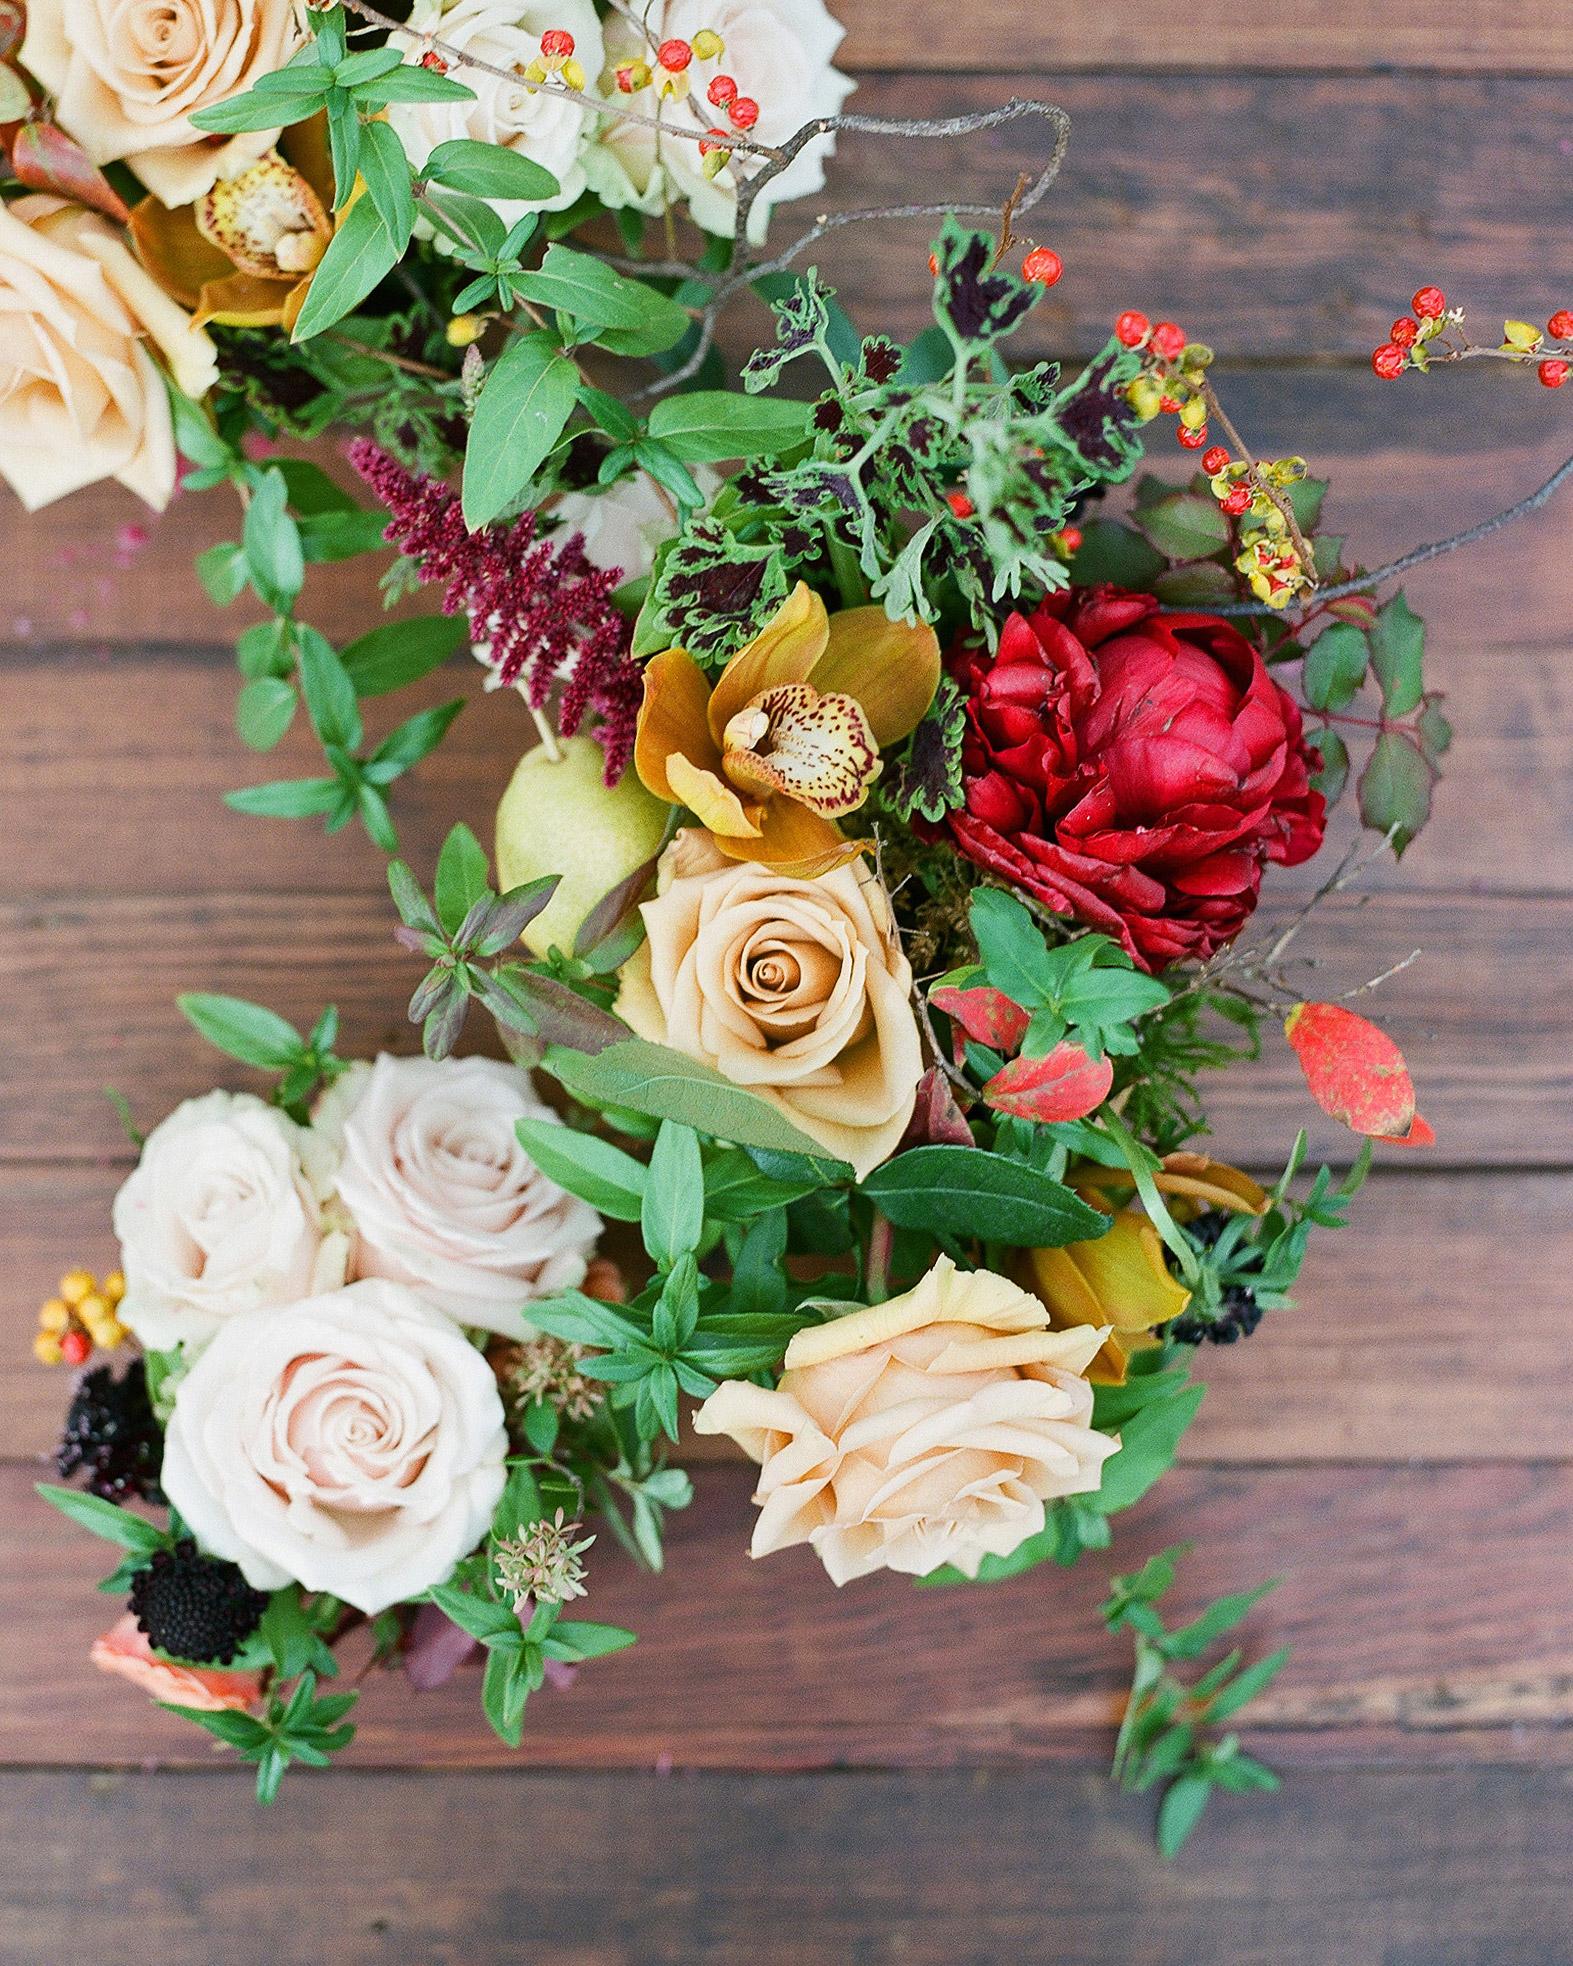 katie-nathan-wedding-thanksgiving-flowers-459-s113017.jpg